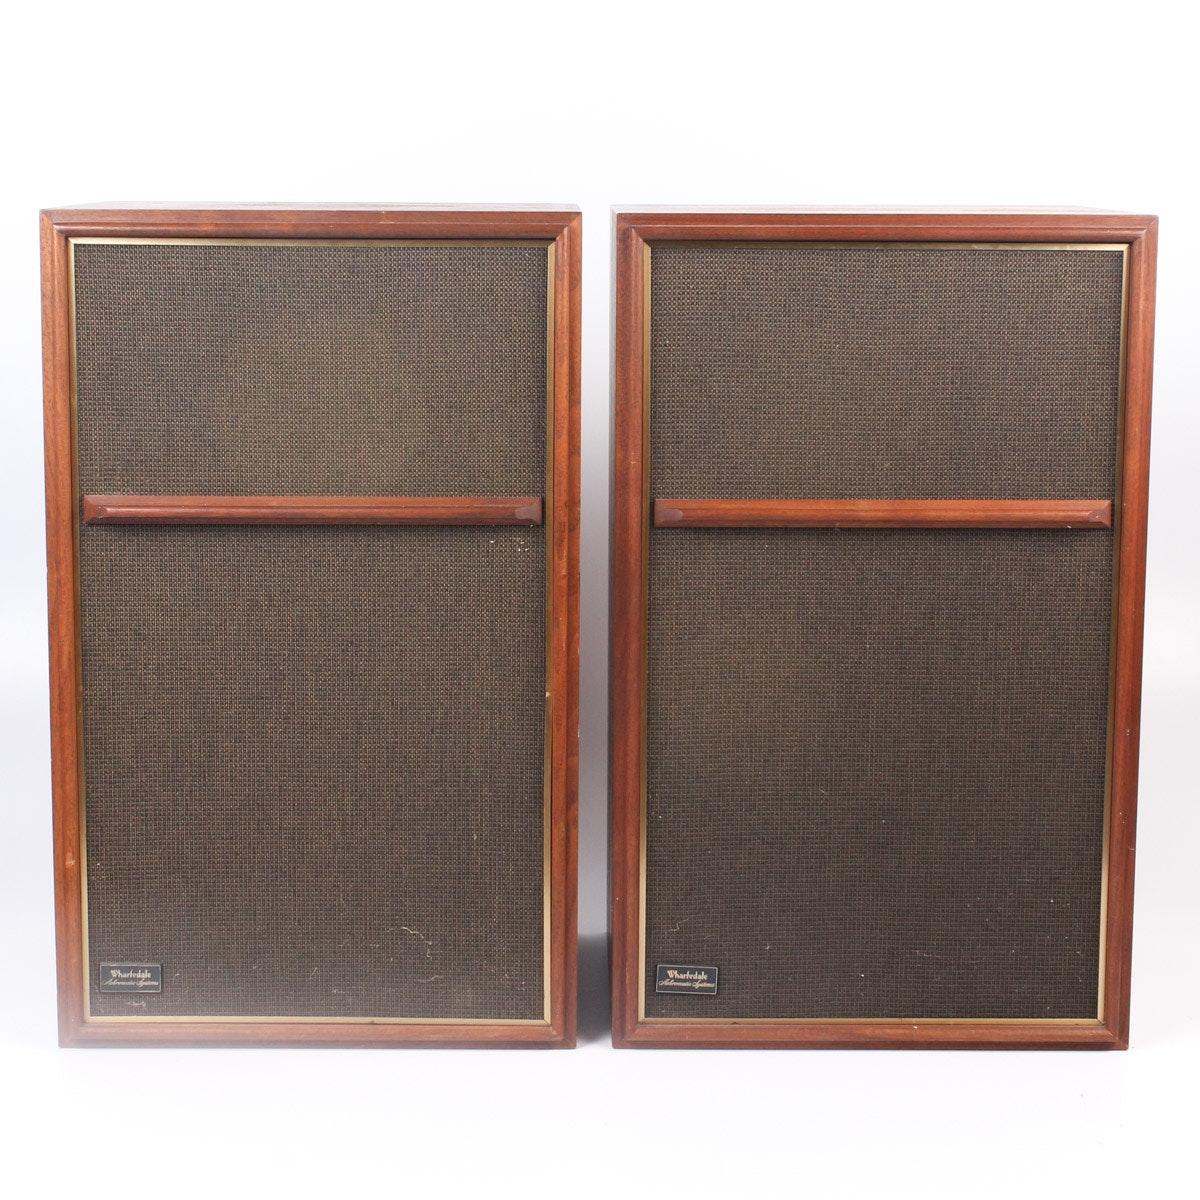 Wharfedale W60E Achromatic Speakers